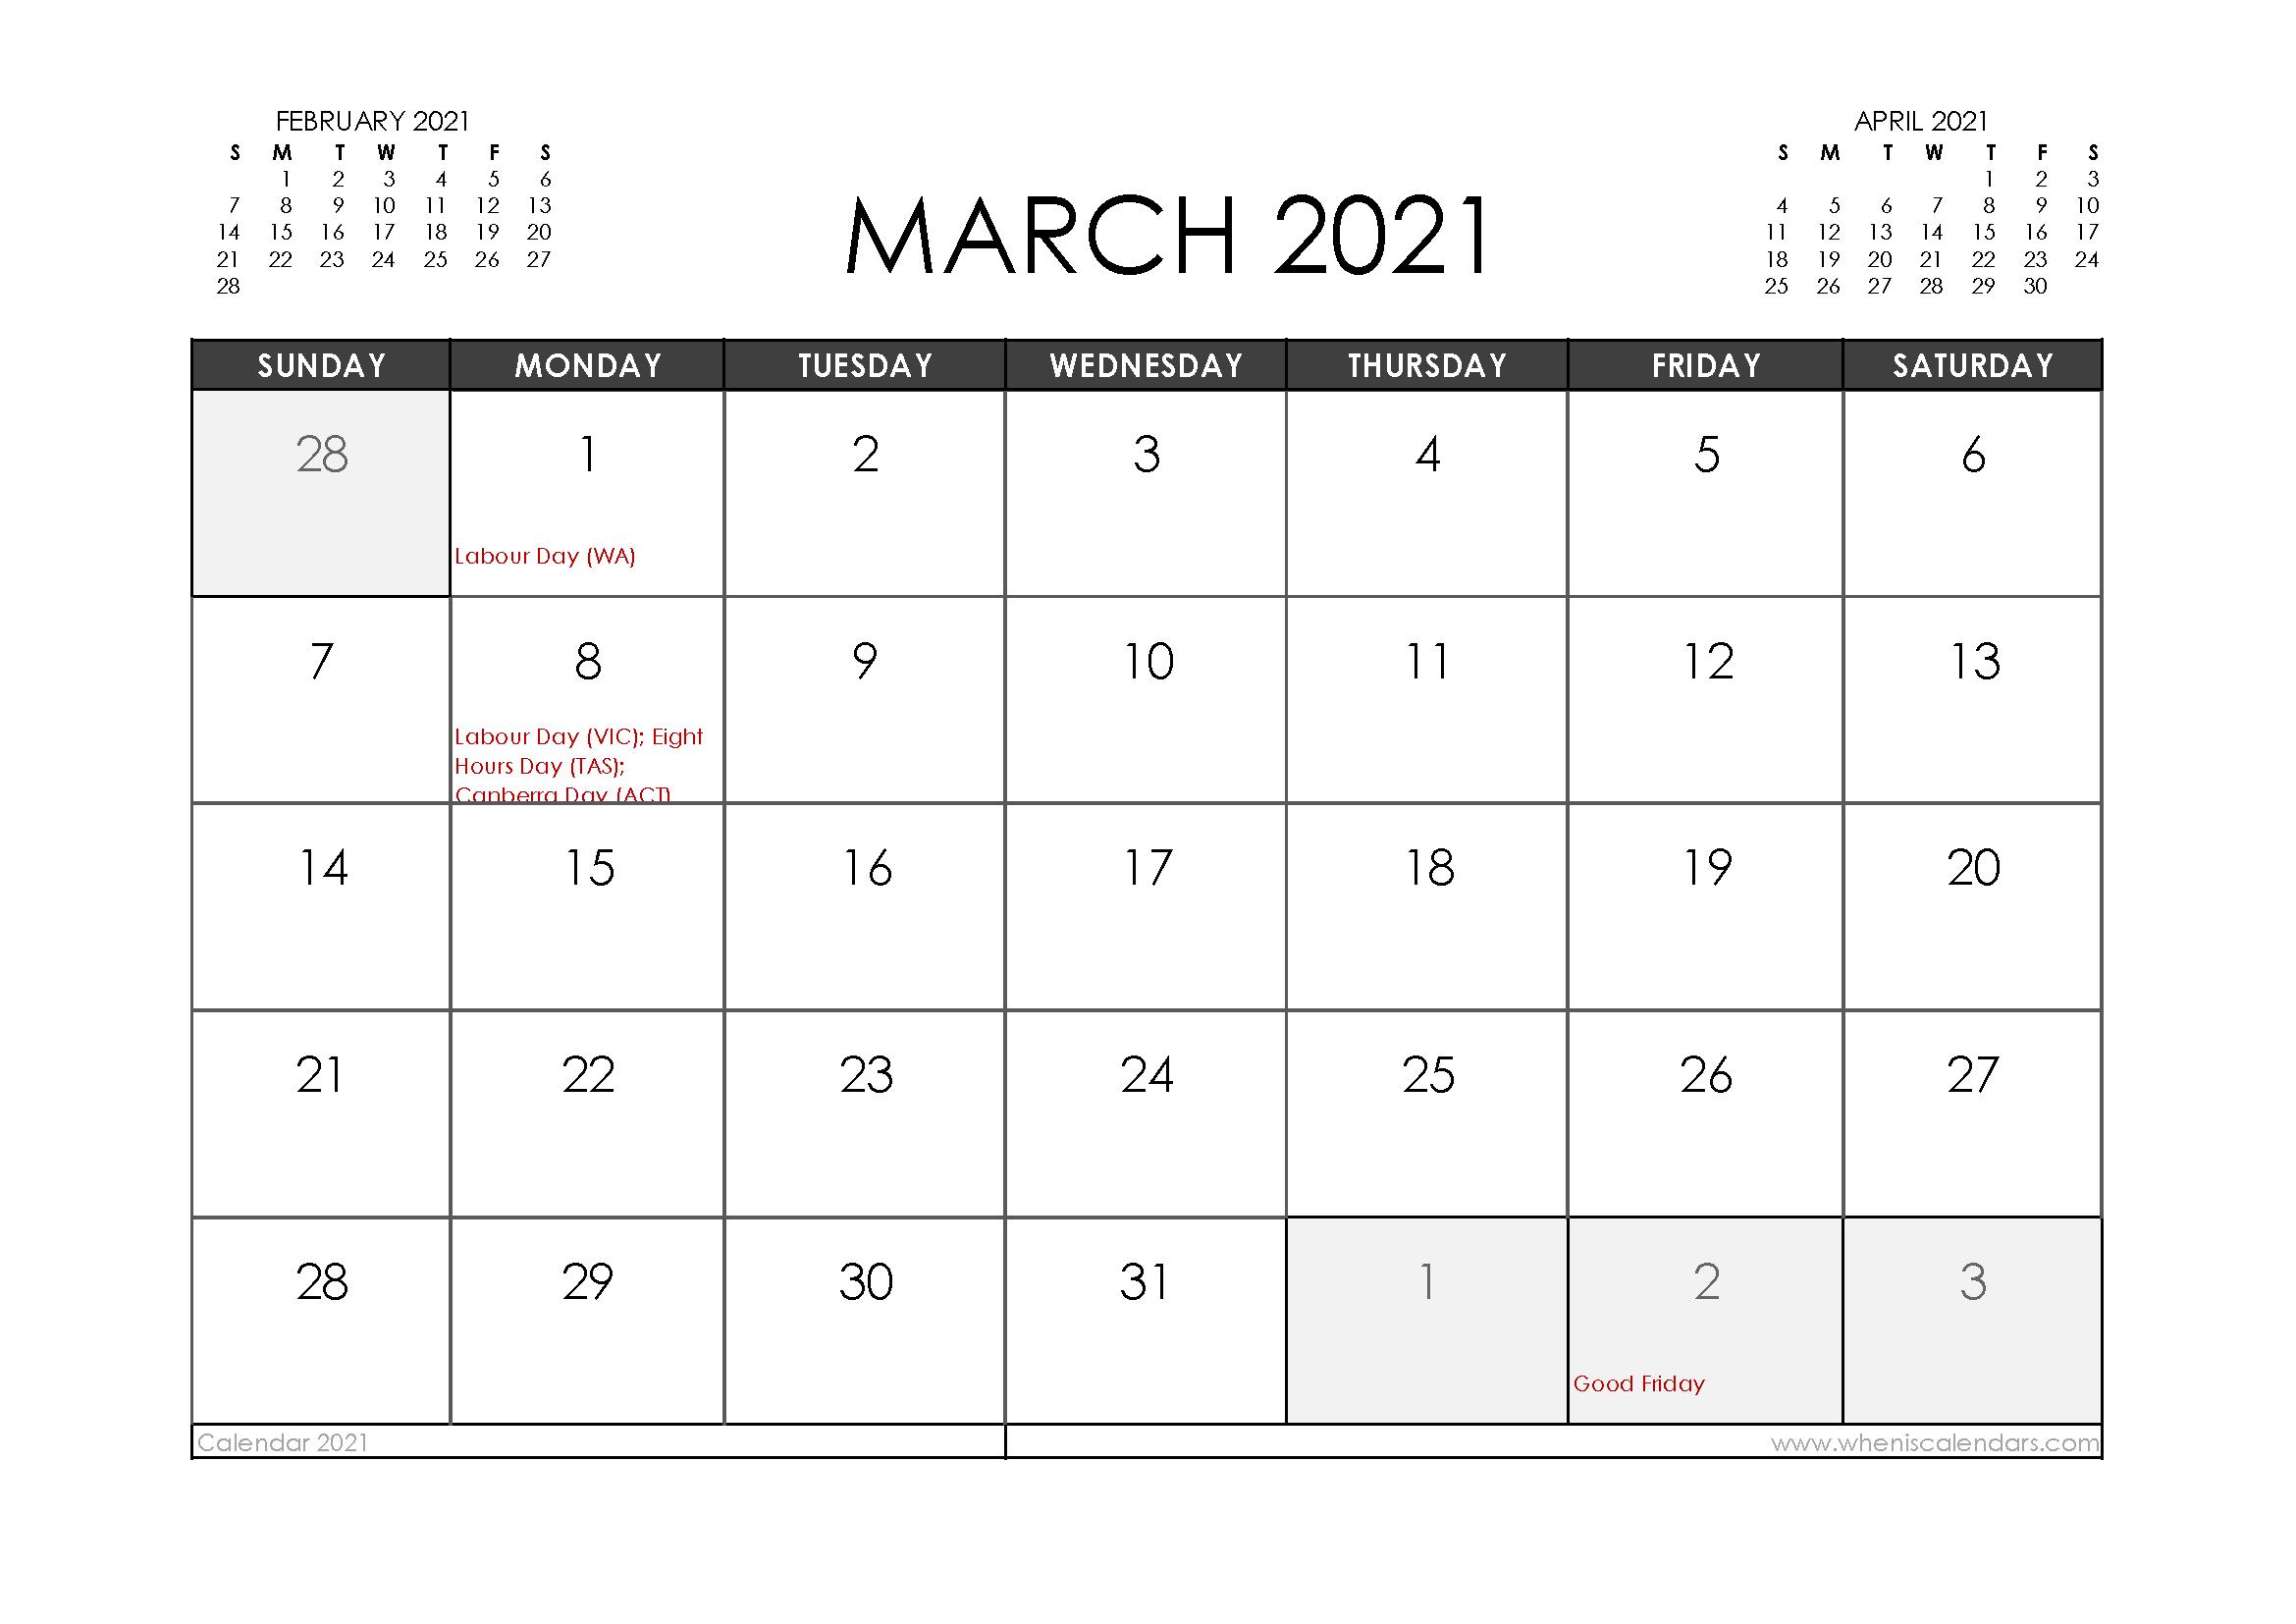 March 2021 Calendar Australia with Holidays